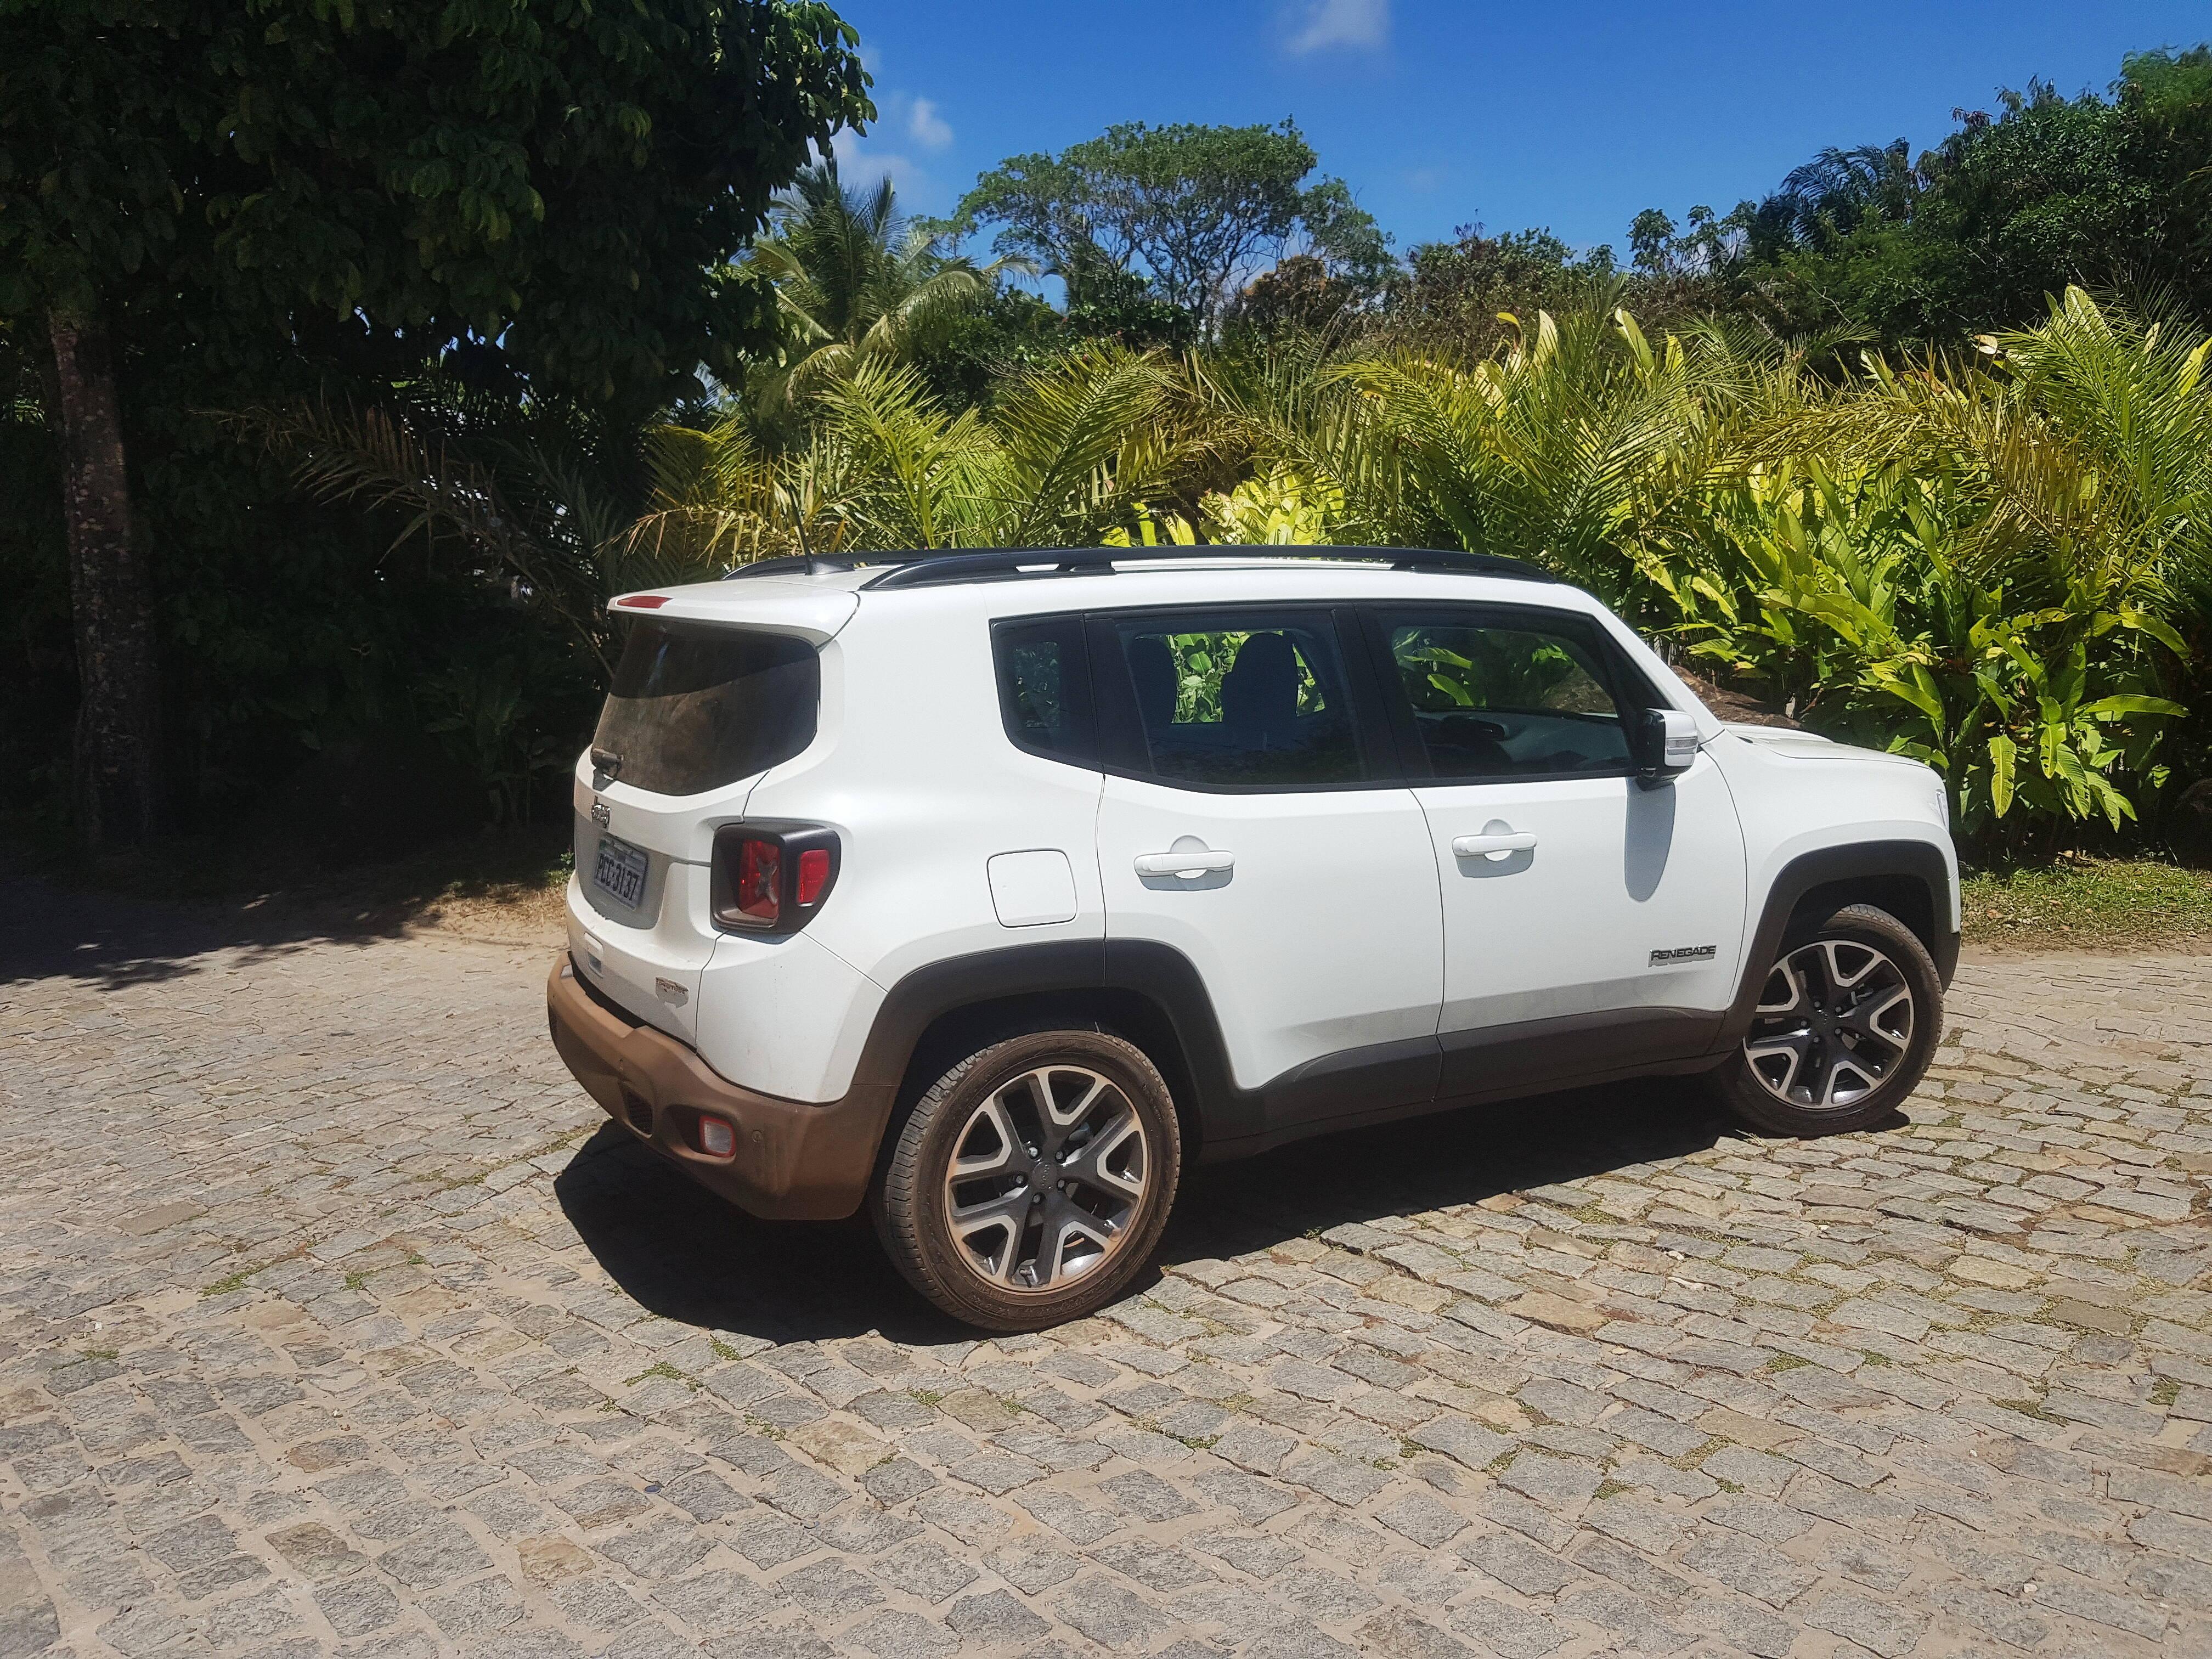 Jeep Renegade 2019. Foto: Cauê Lira/iG Carros